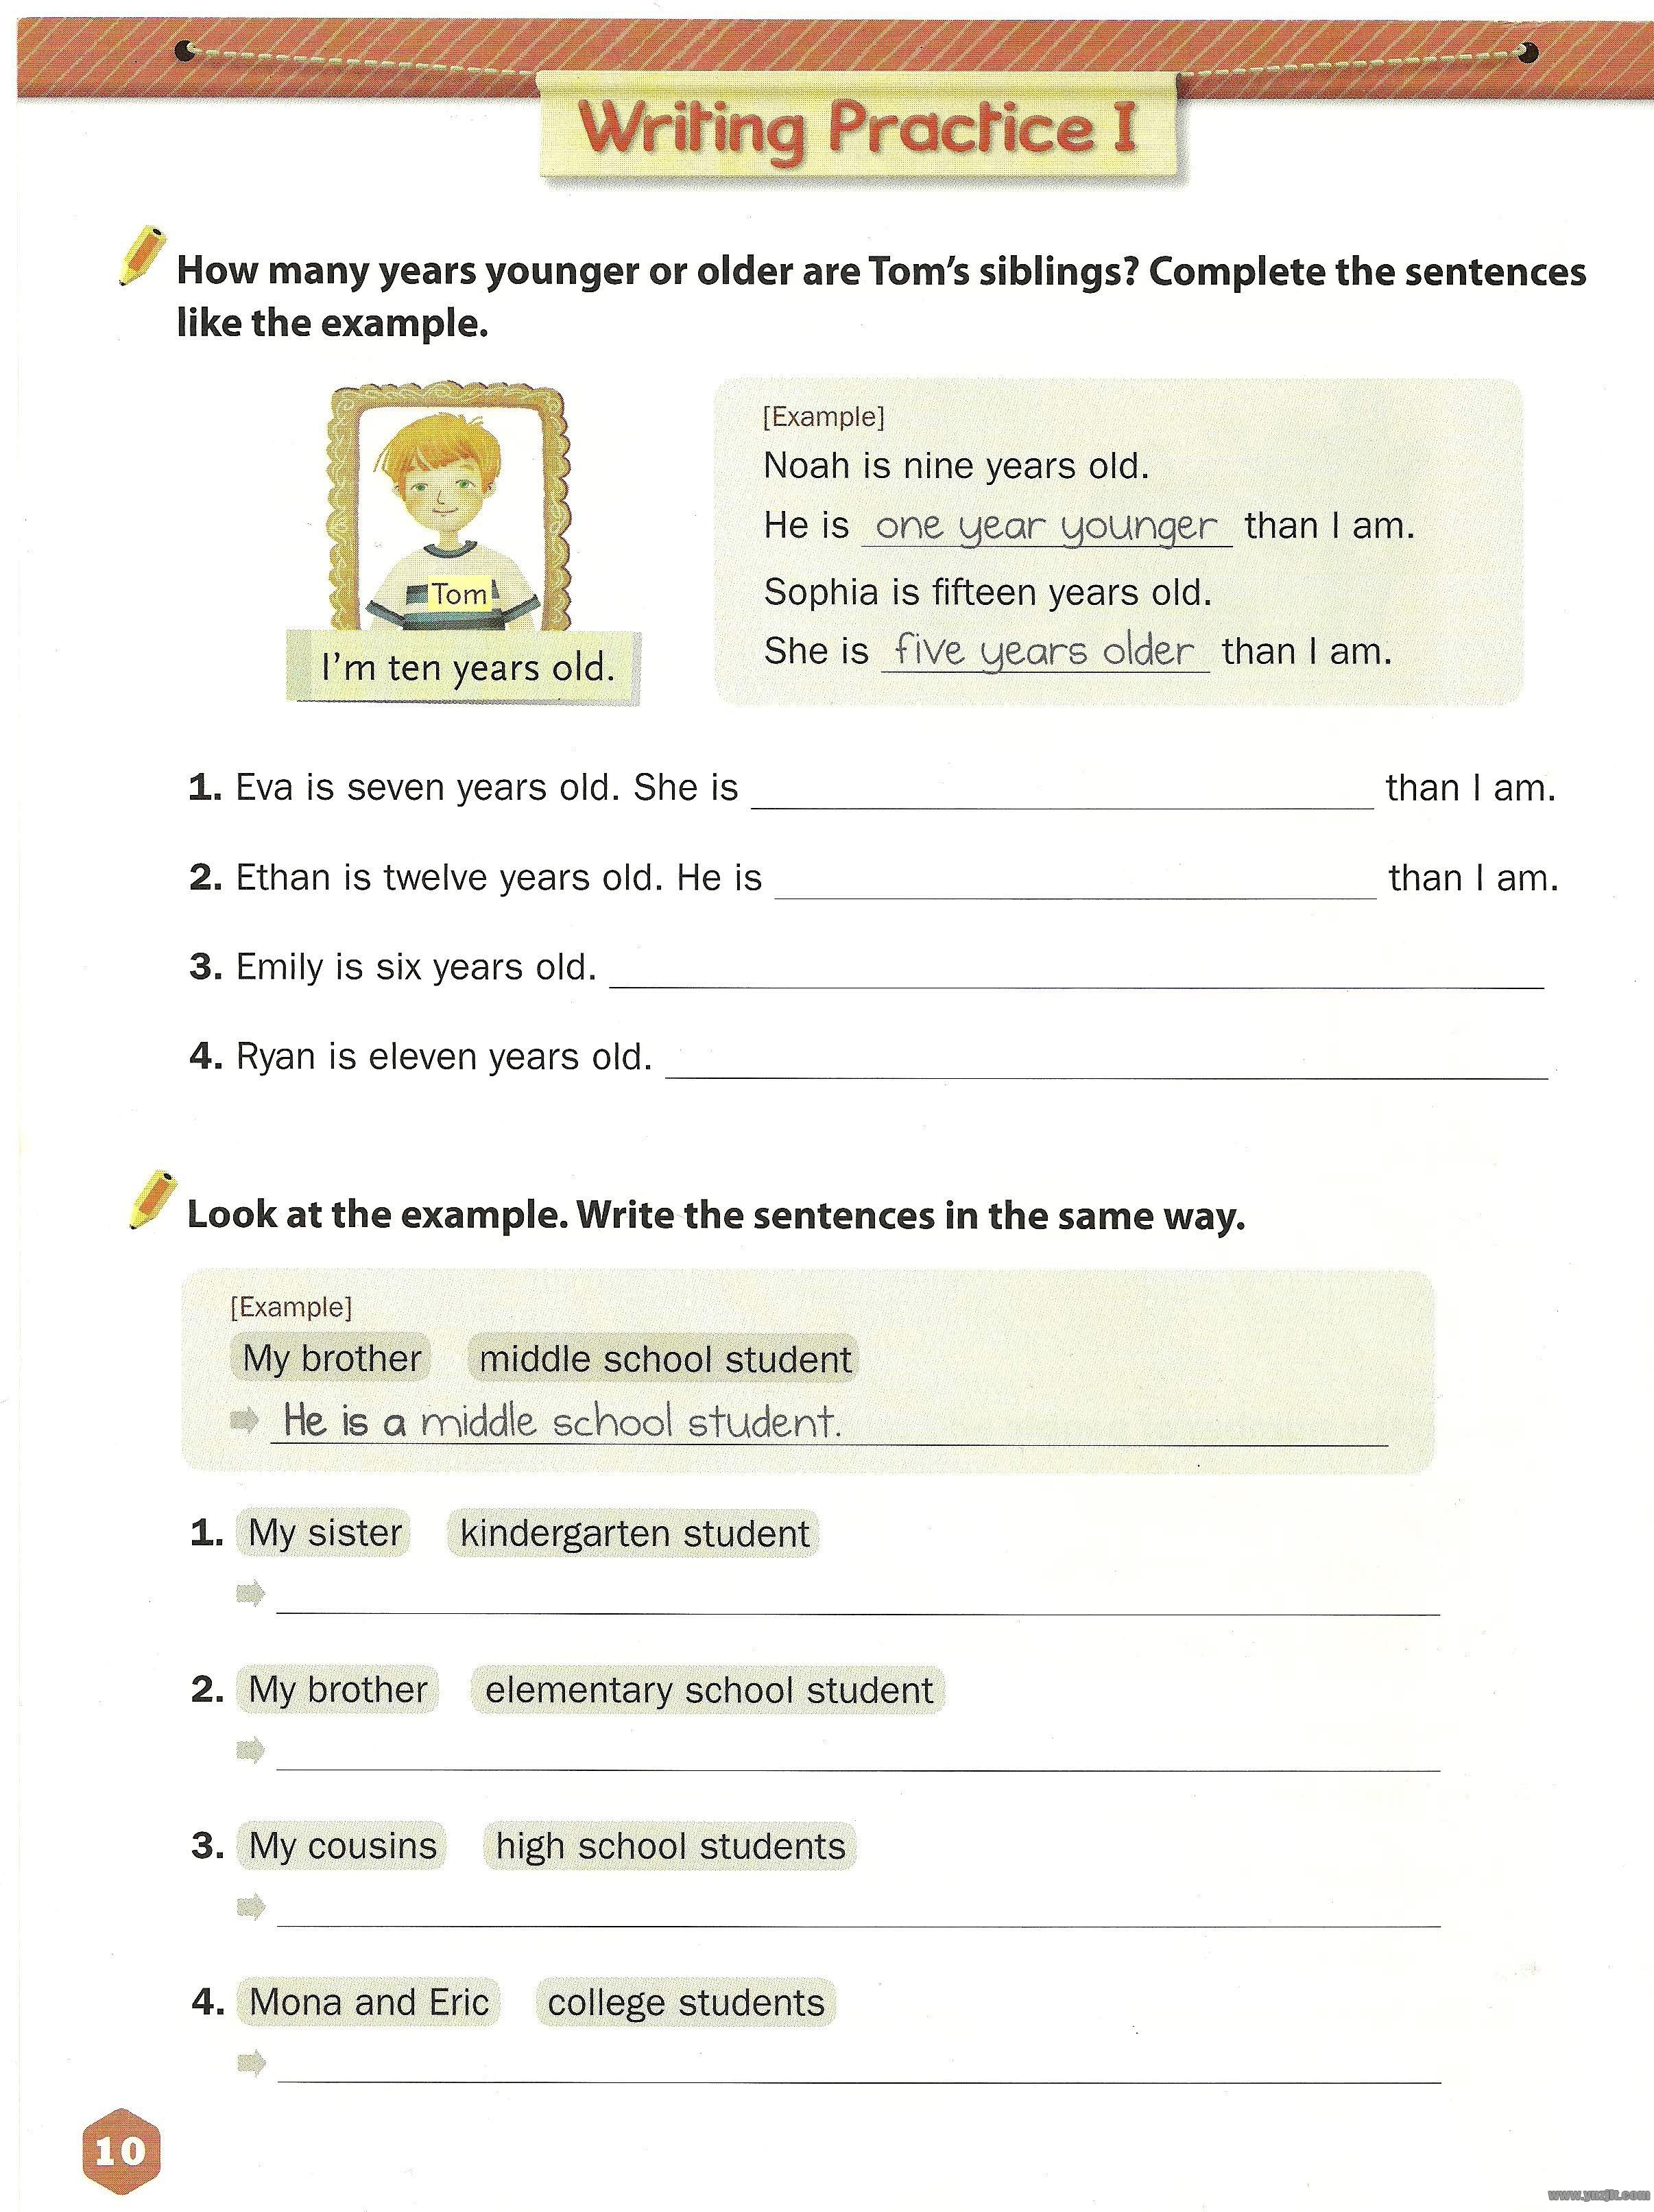 Write Right 10-12岁小升初原版英语写作培训教材NE Build & Grow PDF百度网盘下载